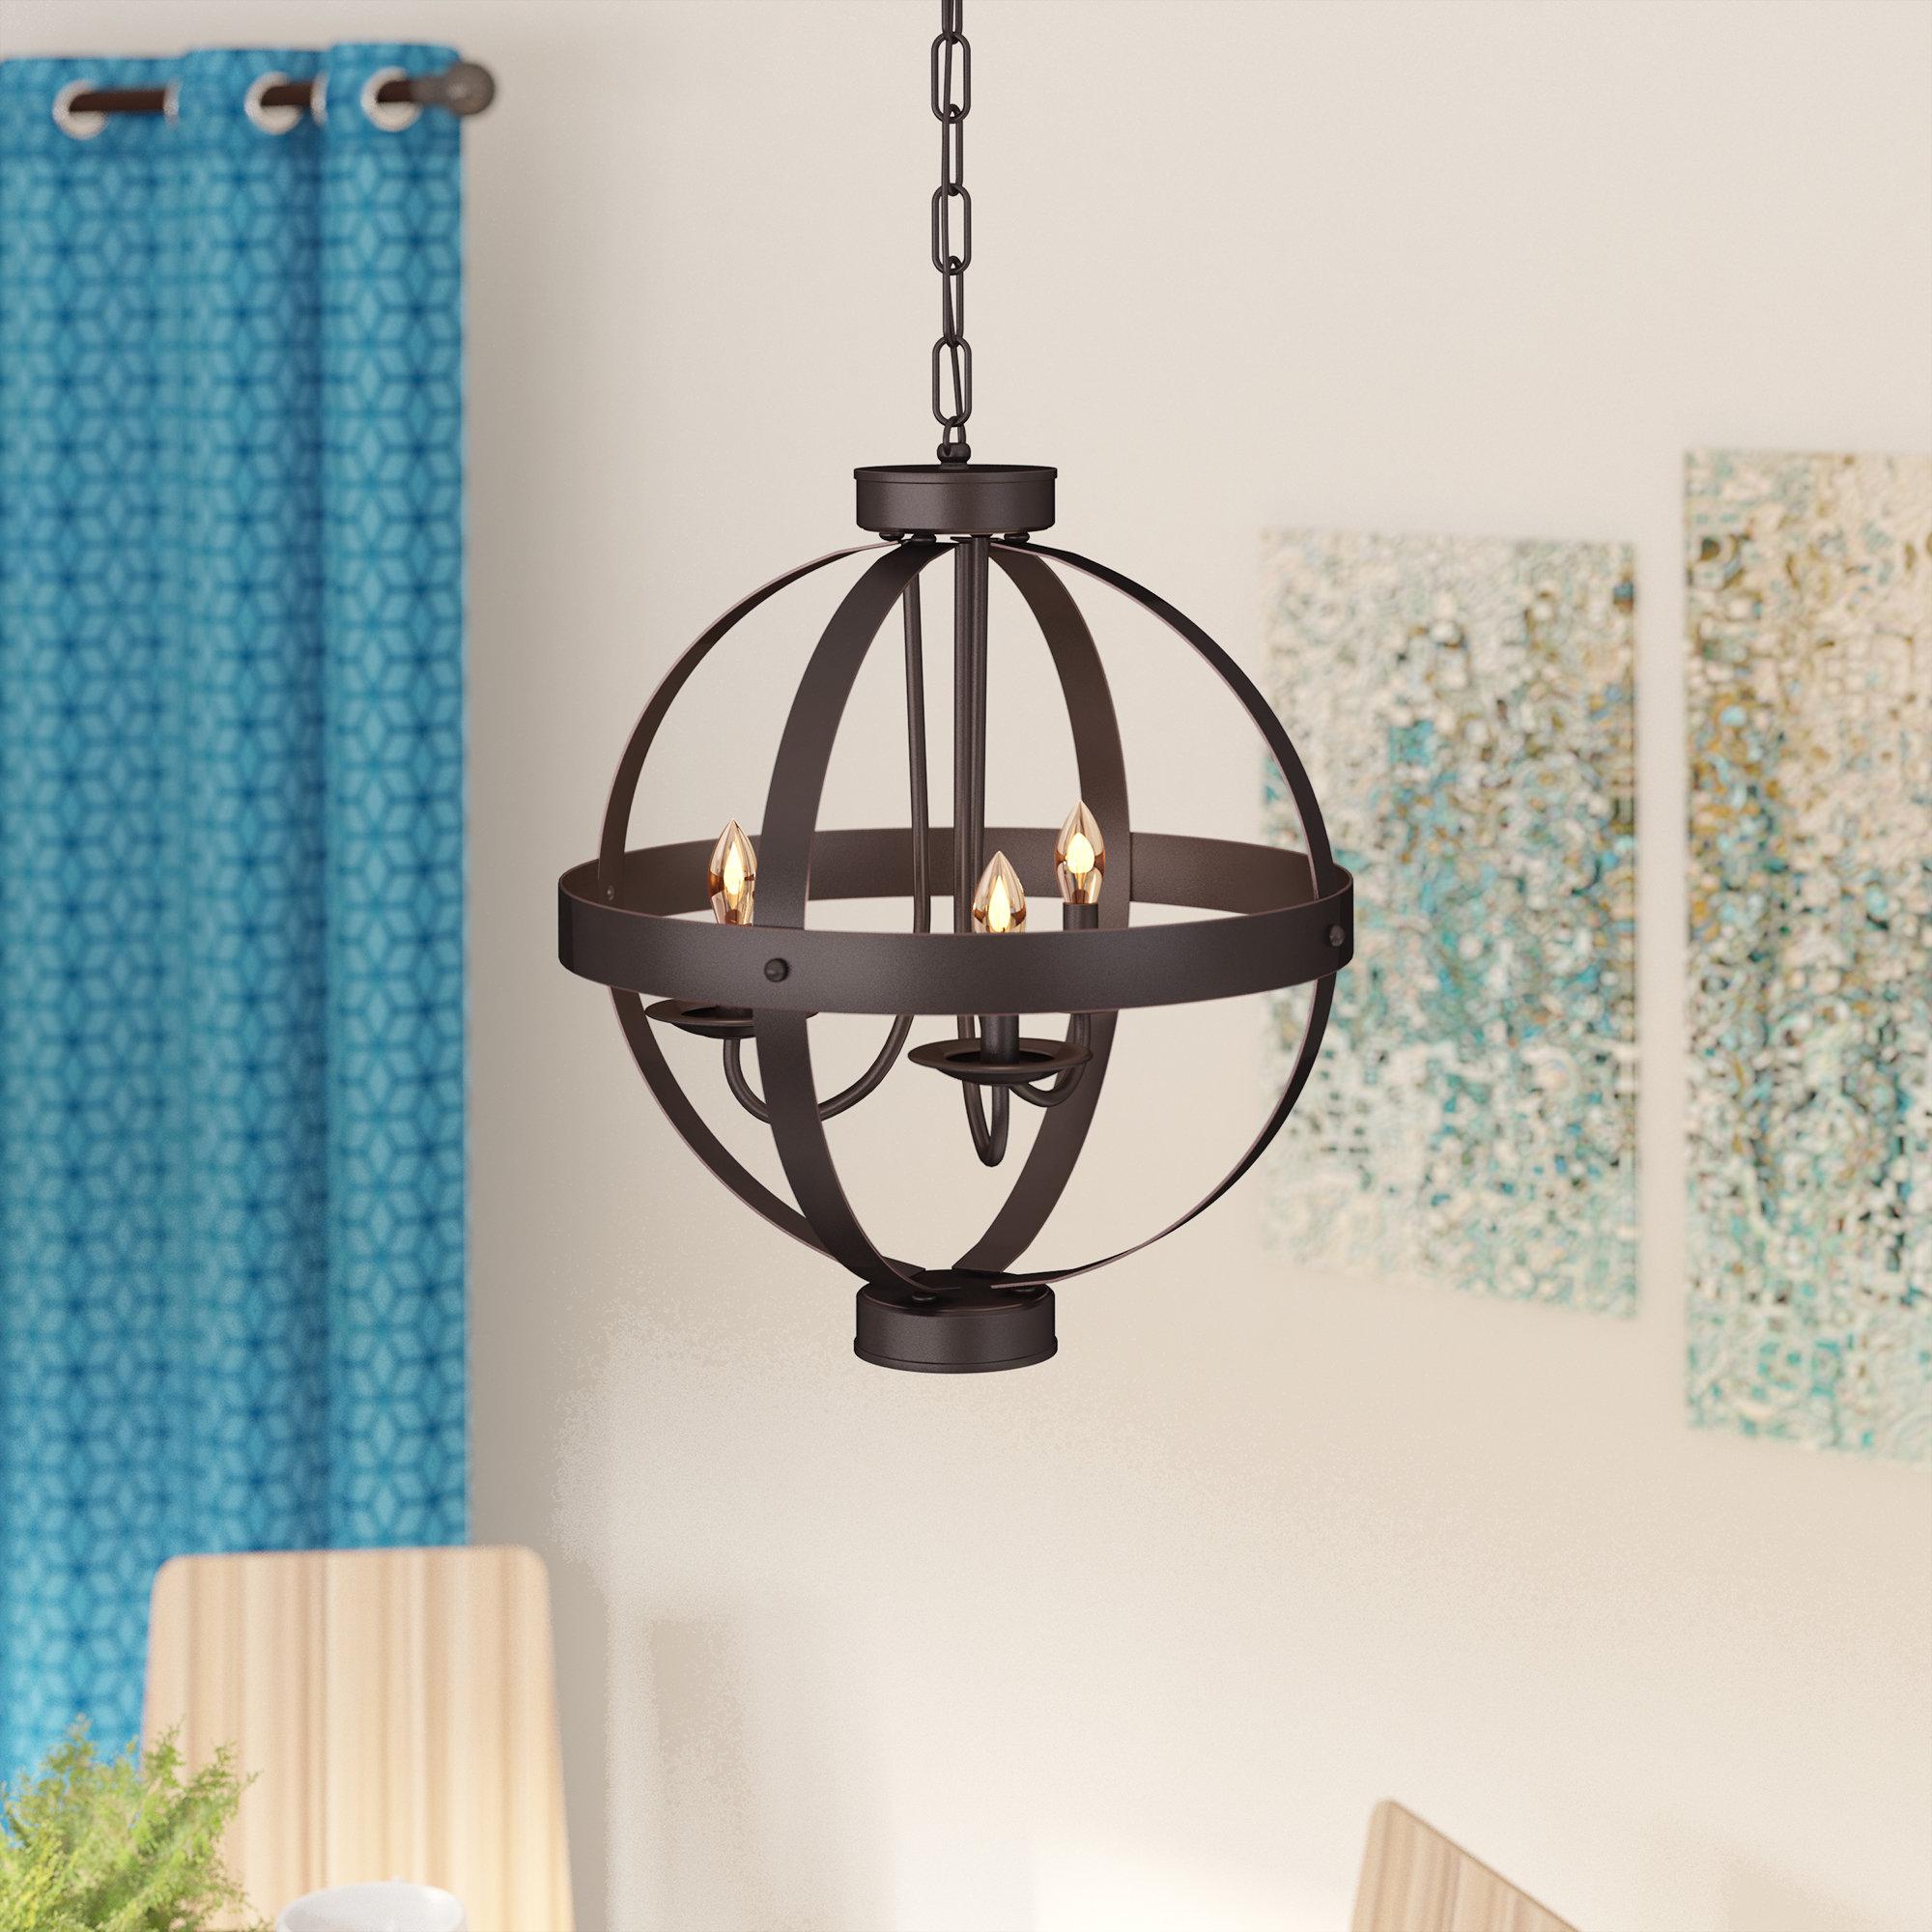 Featured Photo of La Sarre 3 Light Globe Chandeliers